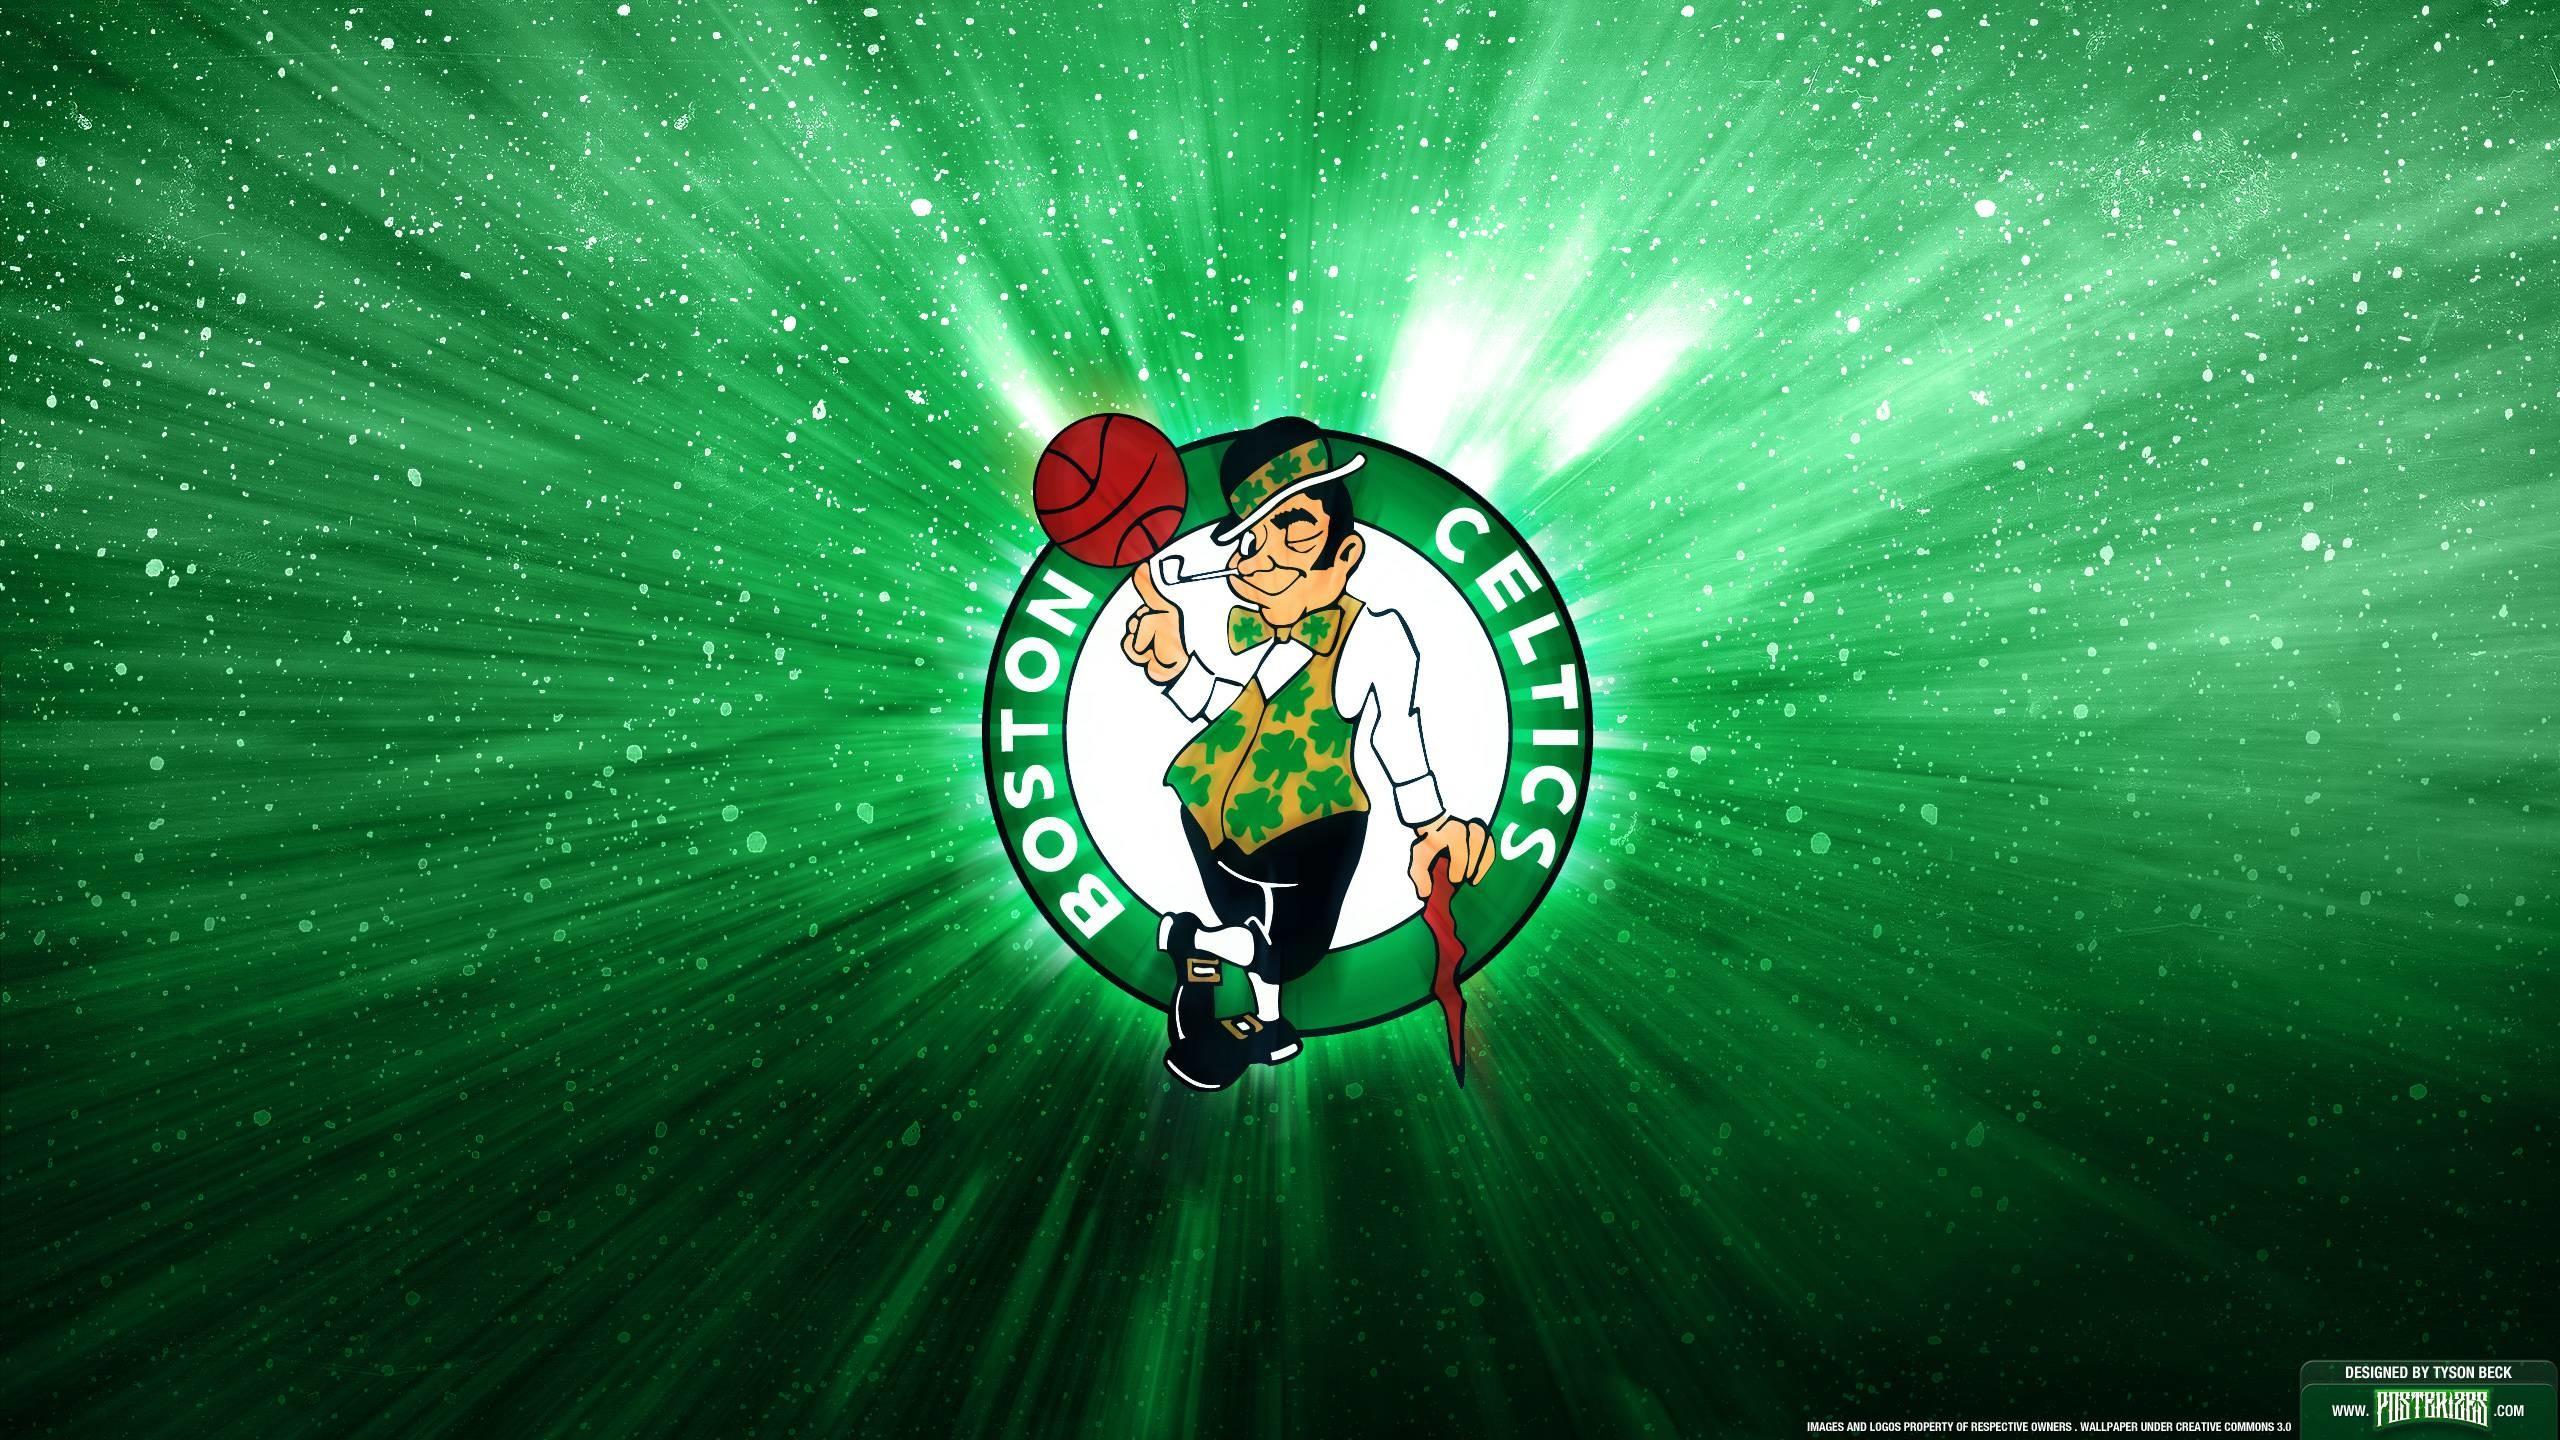 Boston Celtics   Posterizes   NBA Wallpapers & Basketball Designs .